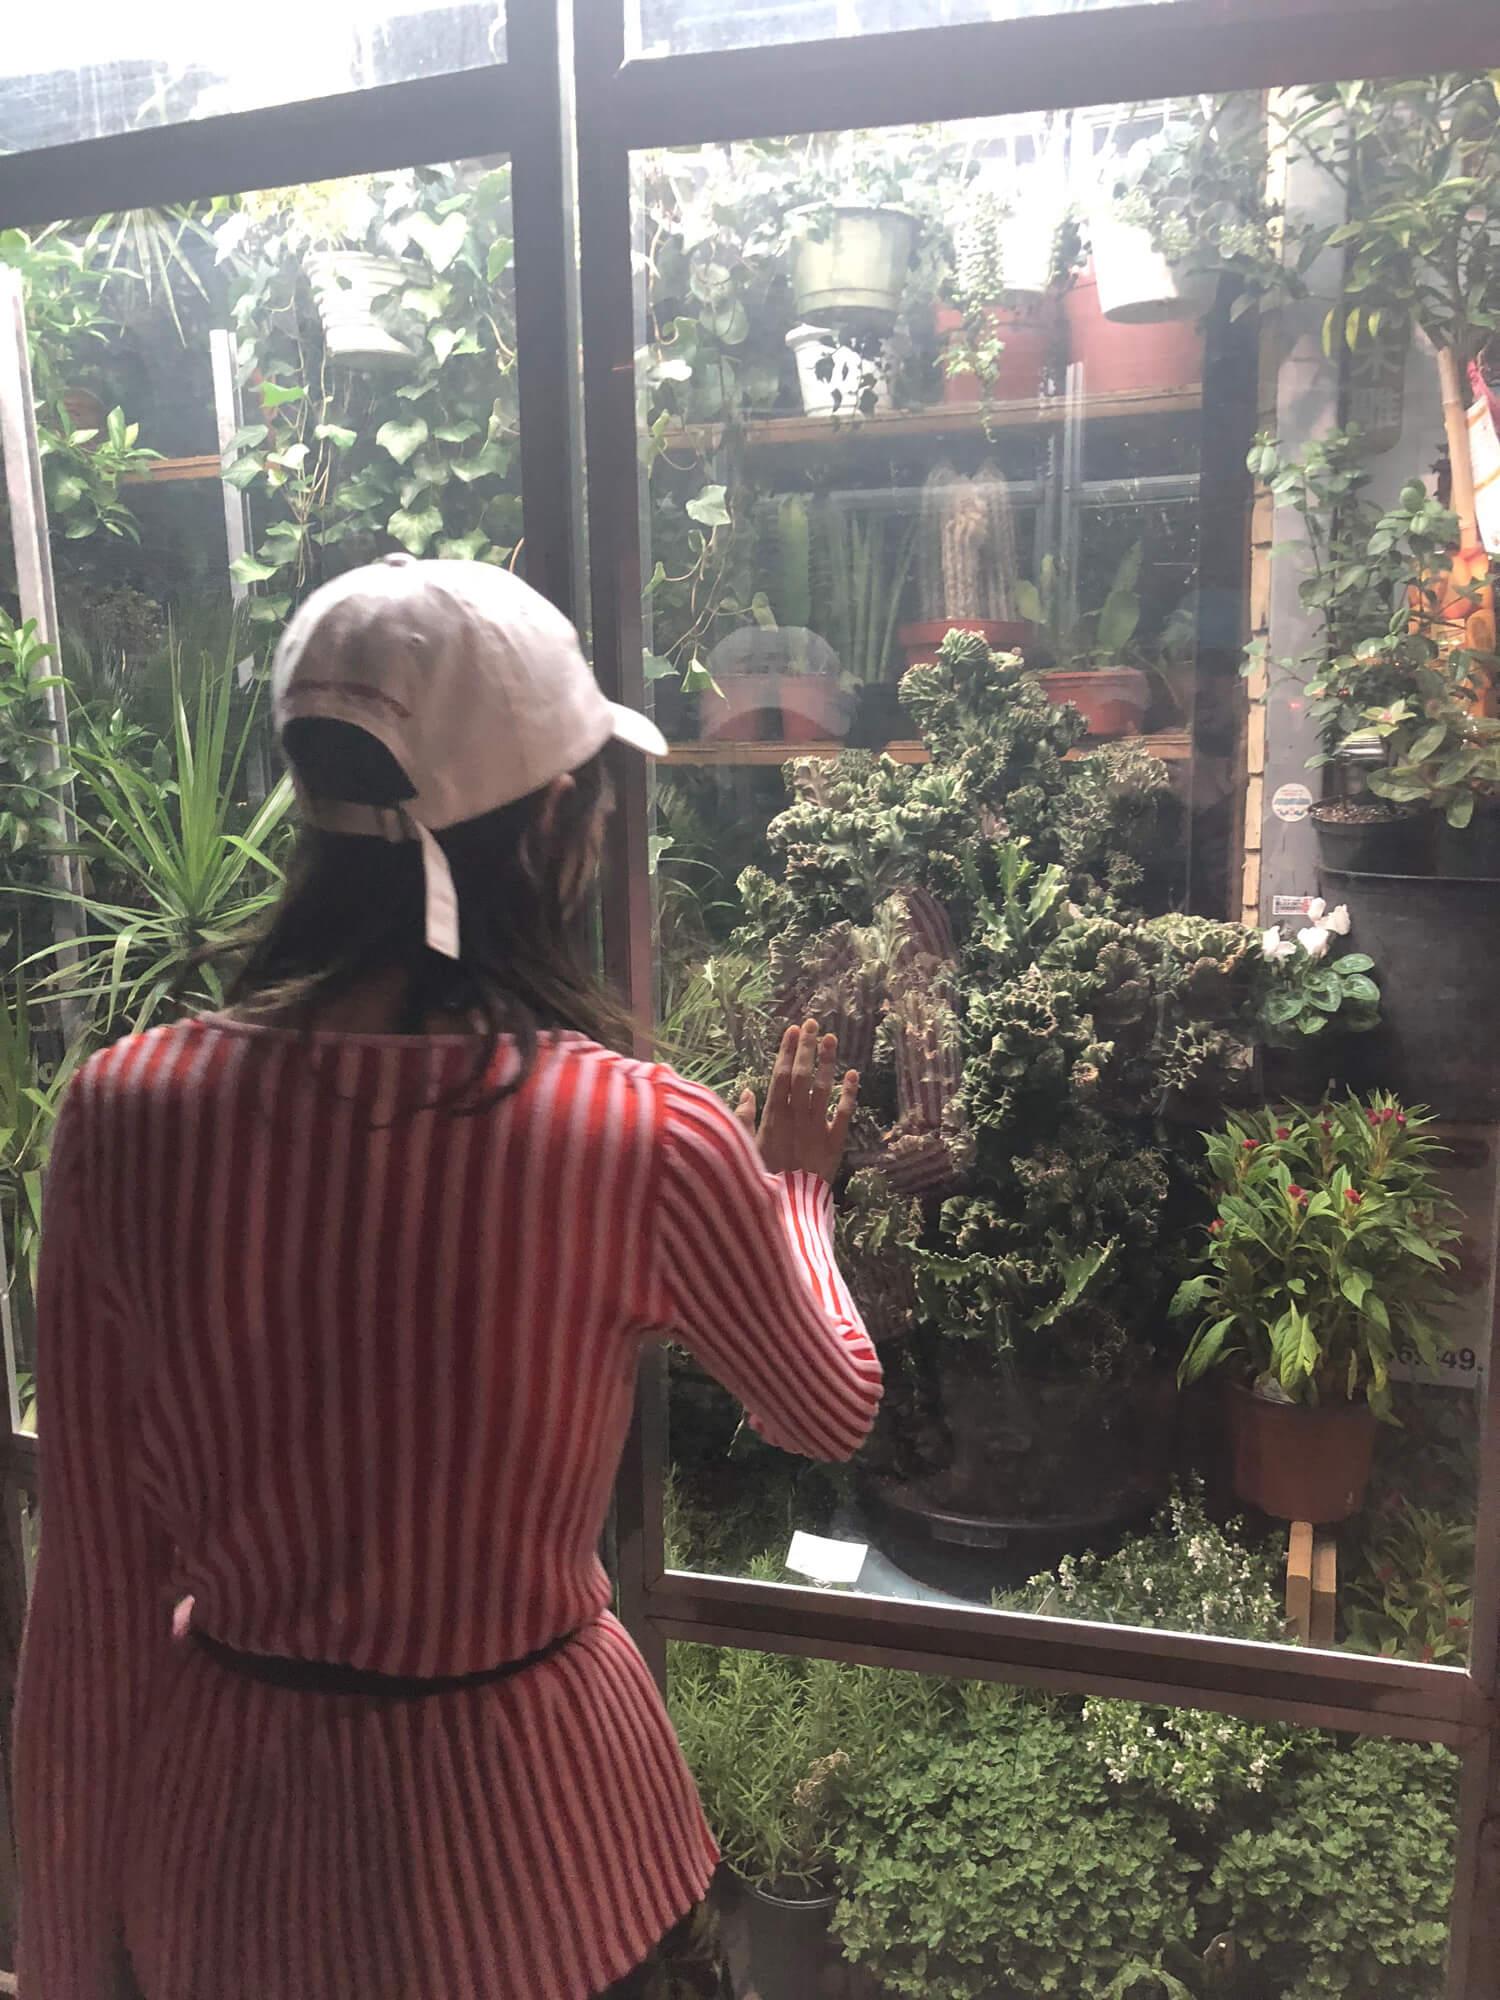 https://liararoux.xxx/wp-content/uploads/2018/10/Liara-Roux-Selfies-and-Snapshots-September-2018-045.jpg